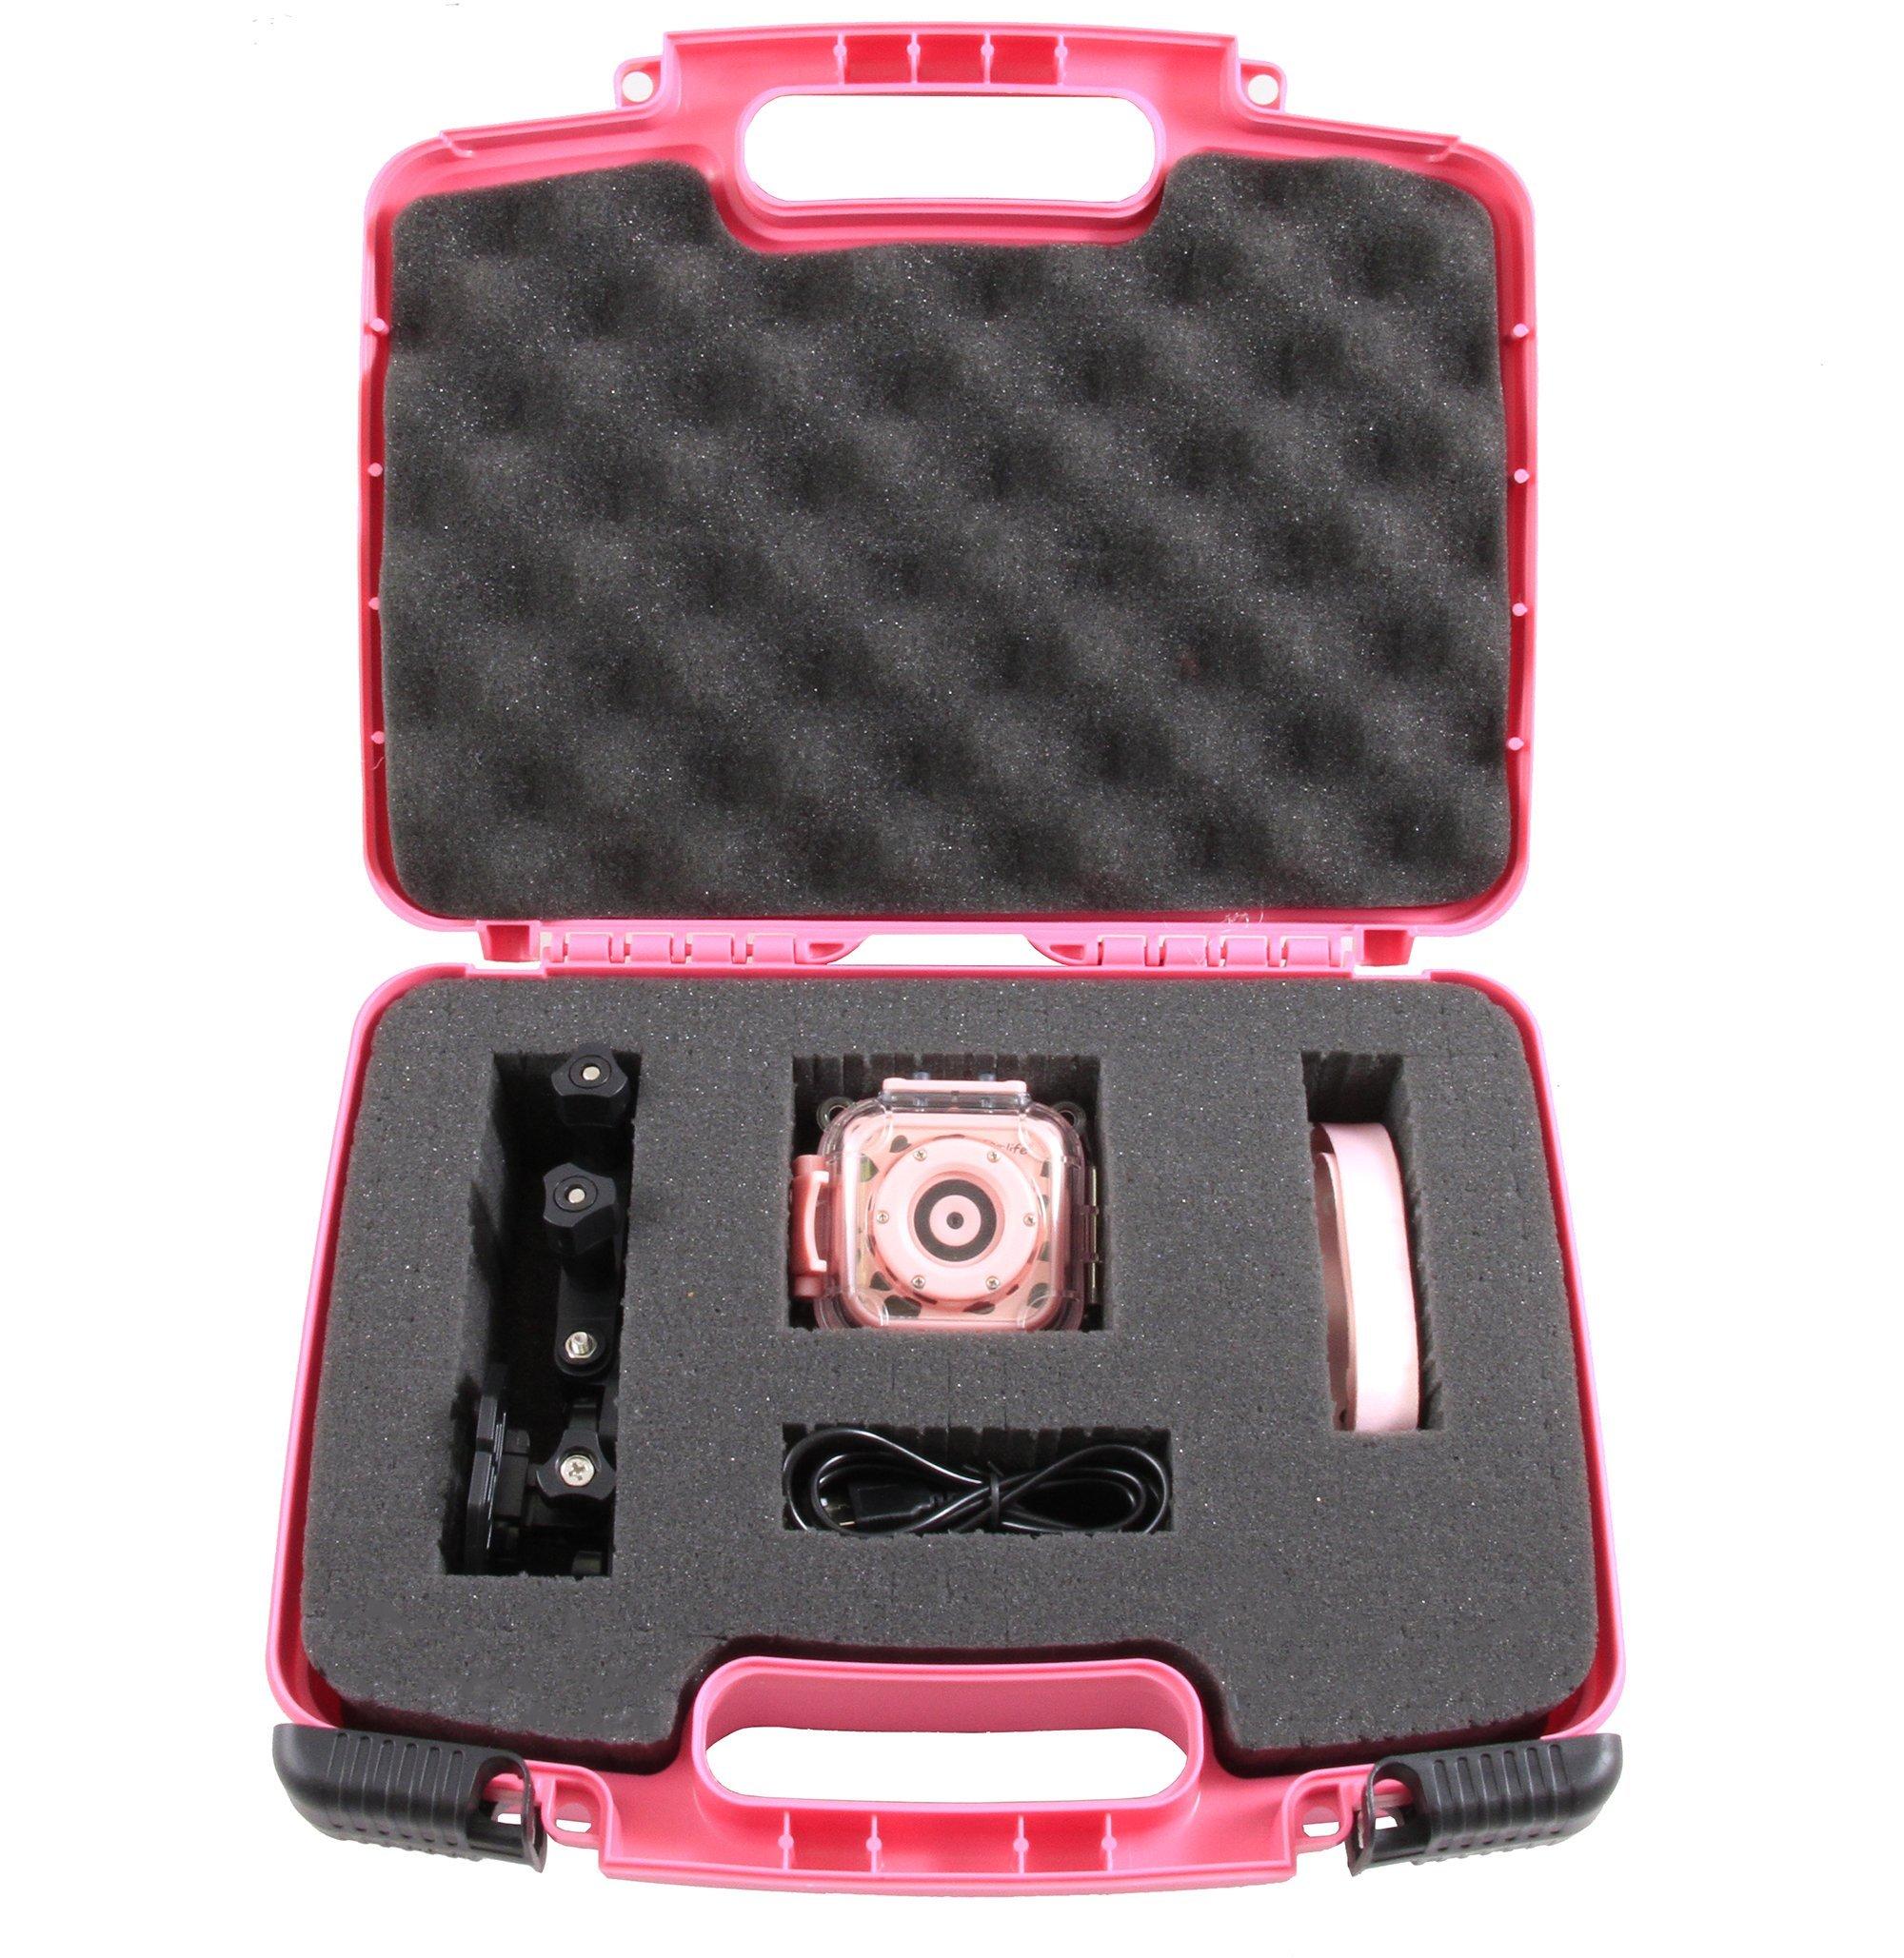 CASEMATIX KIDCASE Pink Kids Waterproof Camera Case Fits Ourlife Kids Waterproof Camera Video Camera, Ourlife Memory Card Accessories In Customizable Foam